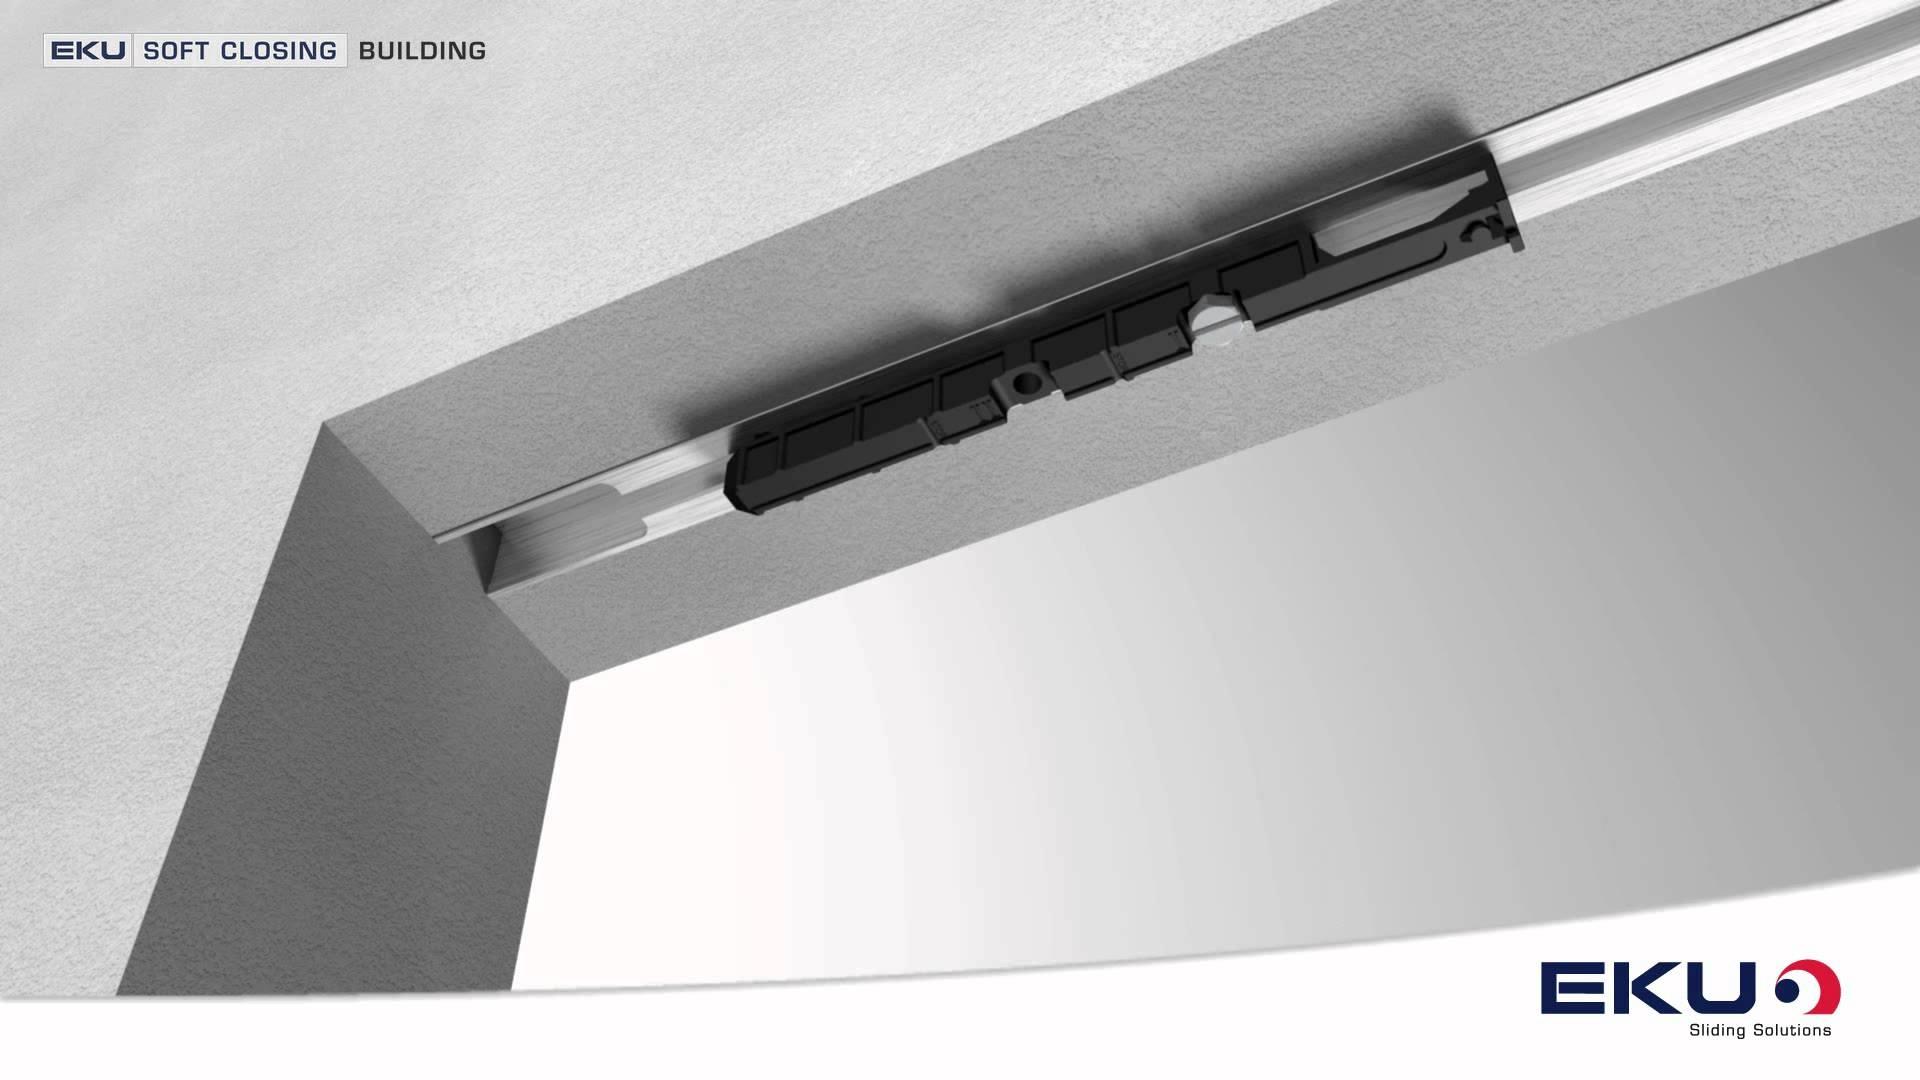 Hafele Automatic Sliding Door System1920 X 1080